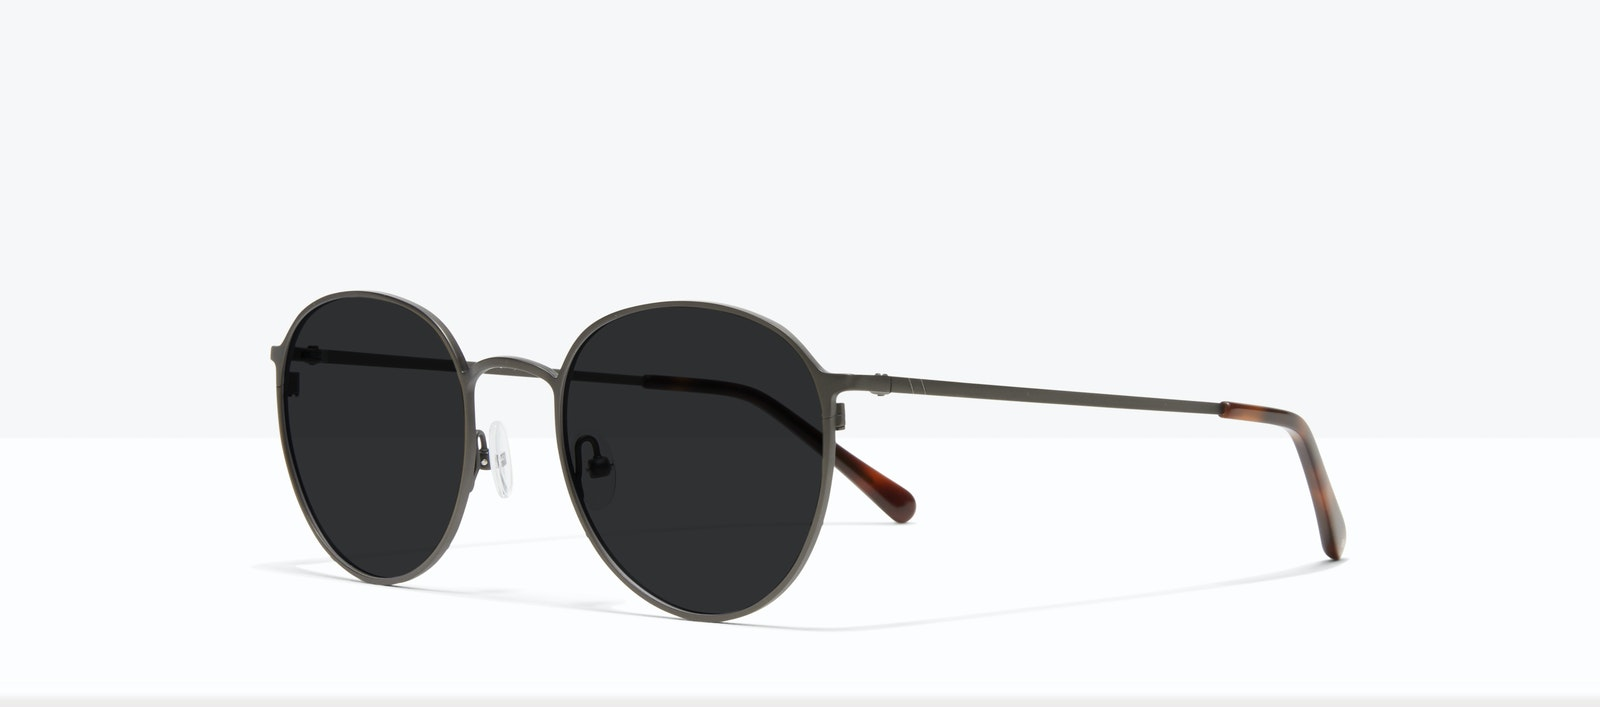 Affordable Fashion Glasses Round Sunglasses Men Ridge Carbon Tilt